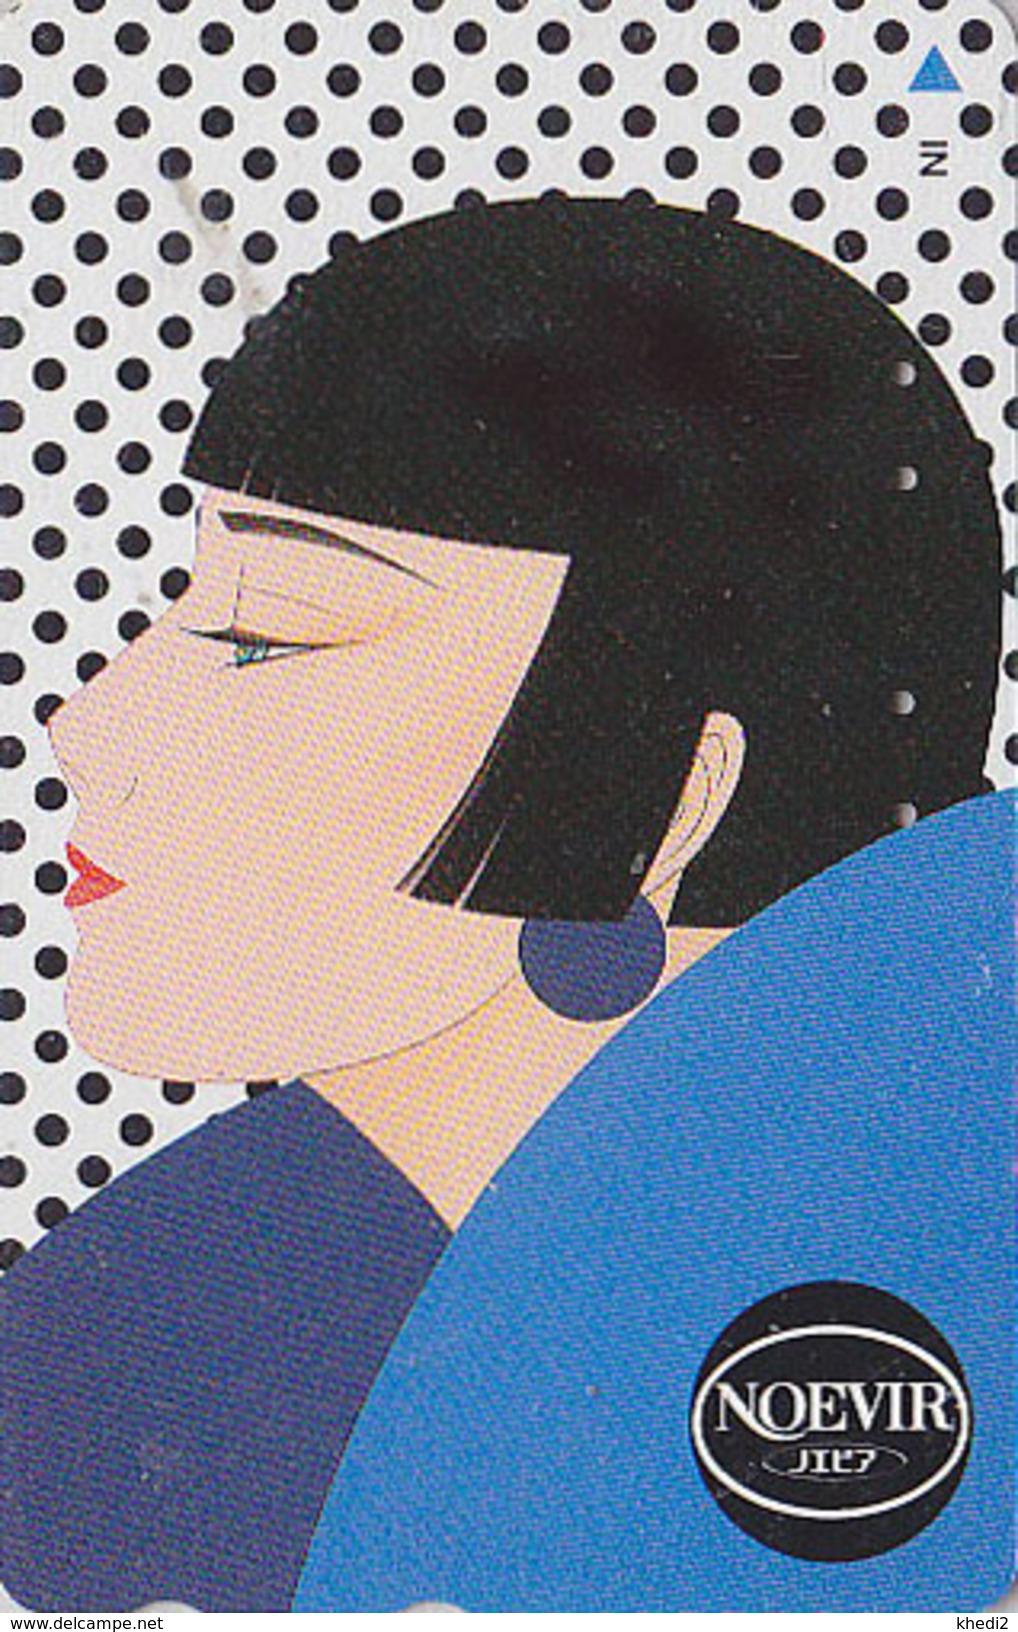 Télécarte Japon / 110-155659 - Cosmétiques NOEVIR / Femme Girl - Japan Cosmetics Cosmetic Phonecard Parfum Perfume - 198 - Parfum